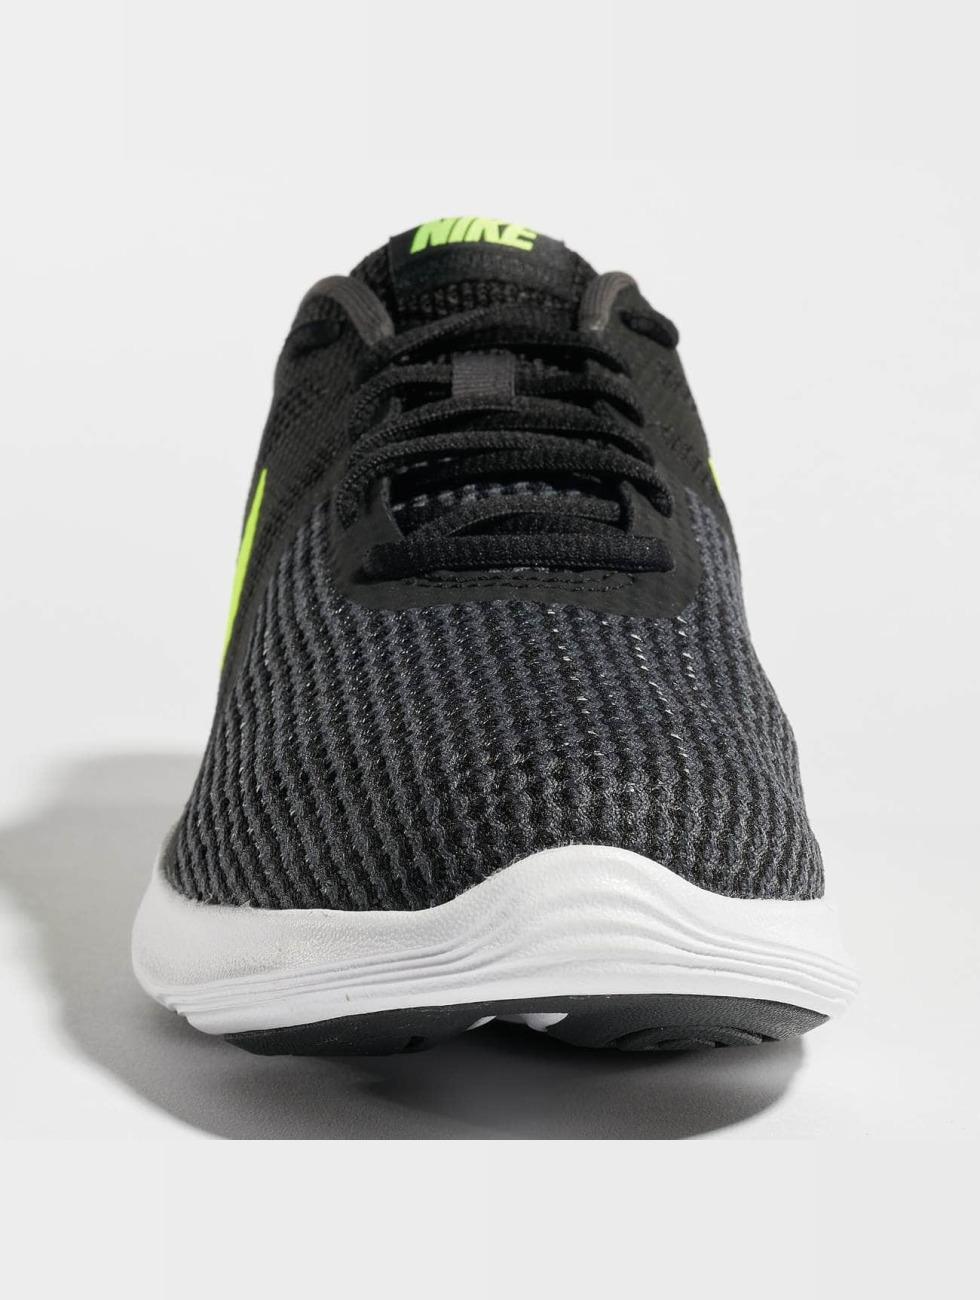 Nike Scarpe Prestazioni / Rivoluzione Sneaker 4 Nero 471 162 n9Kf26SoHN